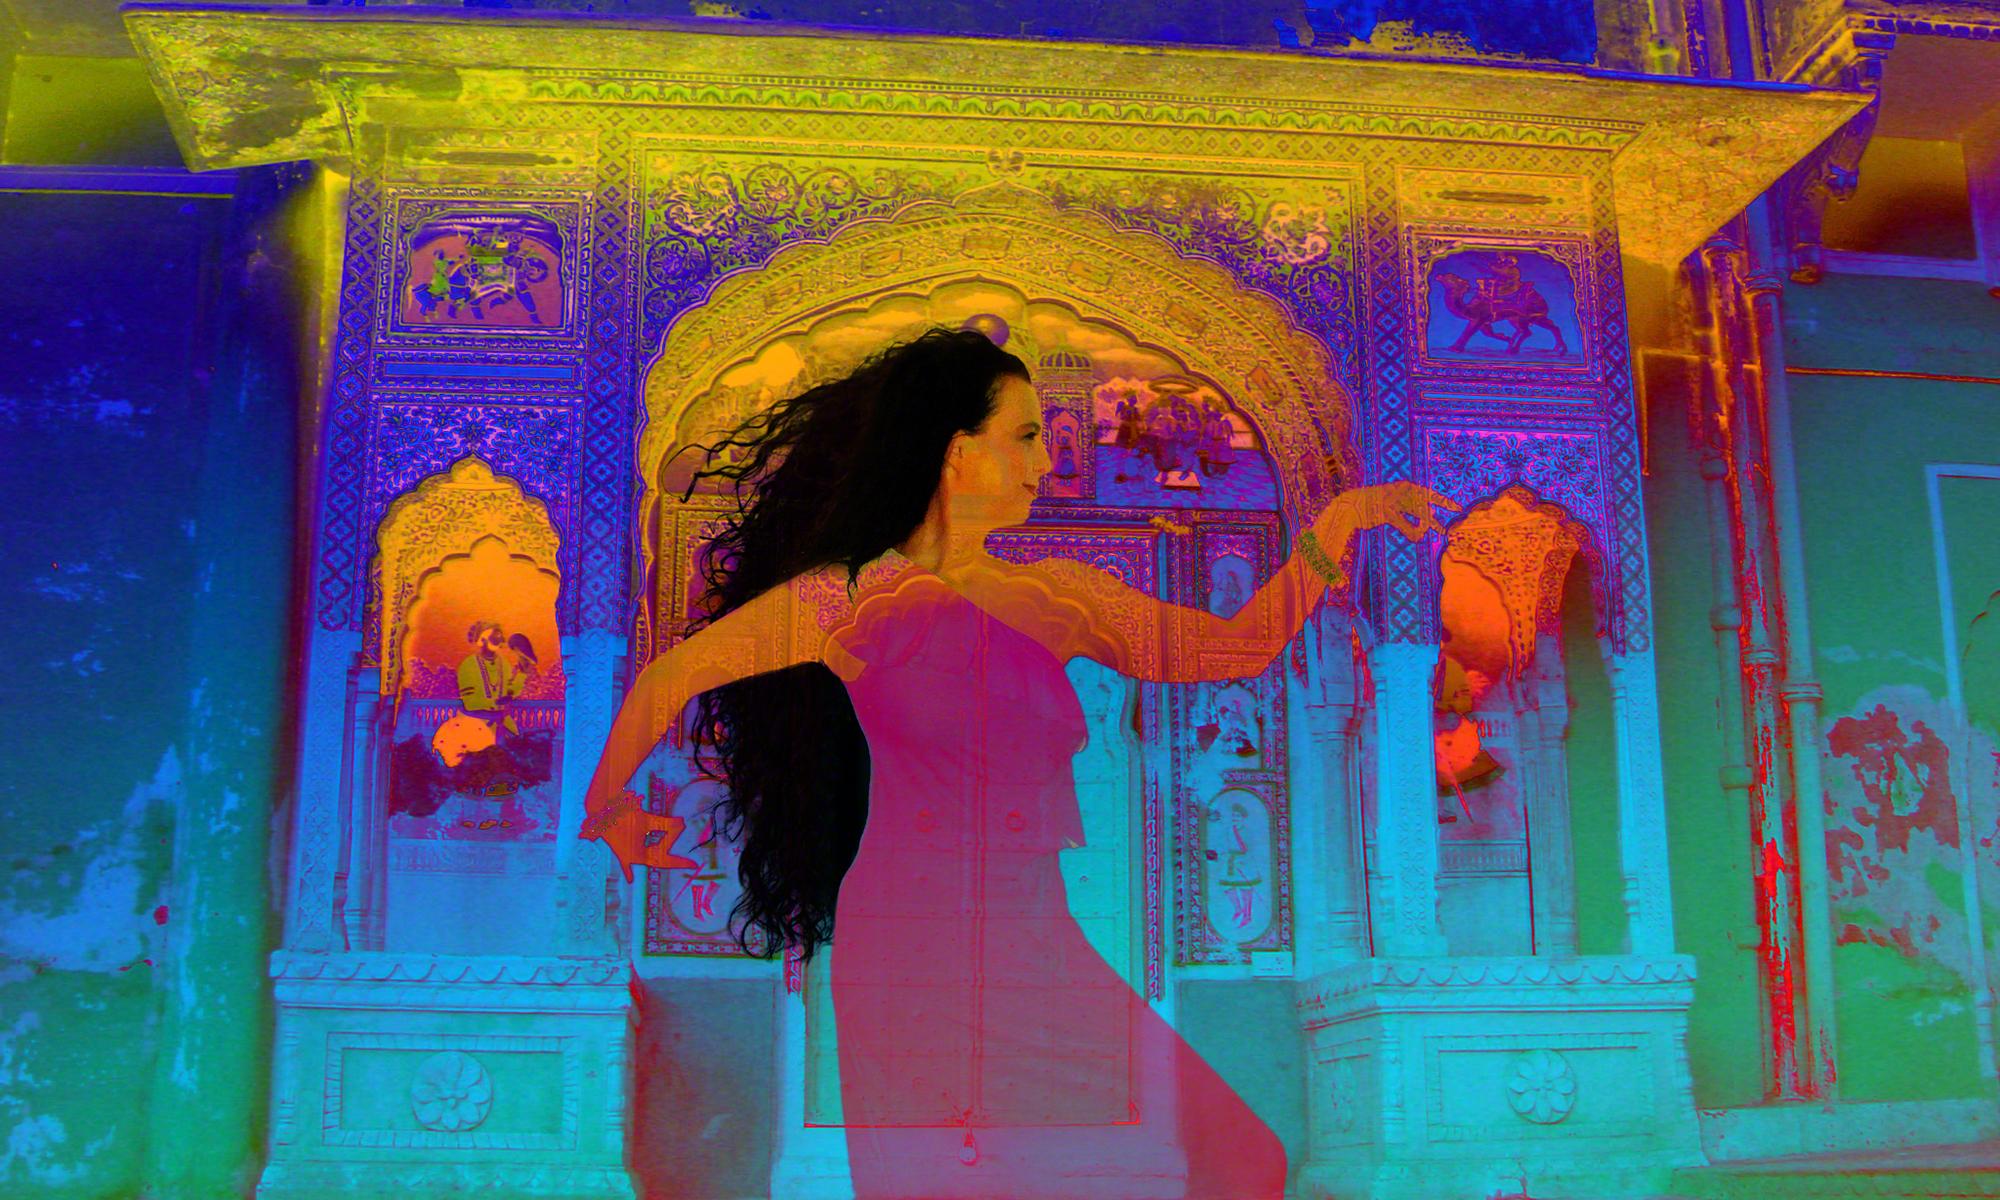 Mantra Pop by Canda & Guru Atman